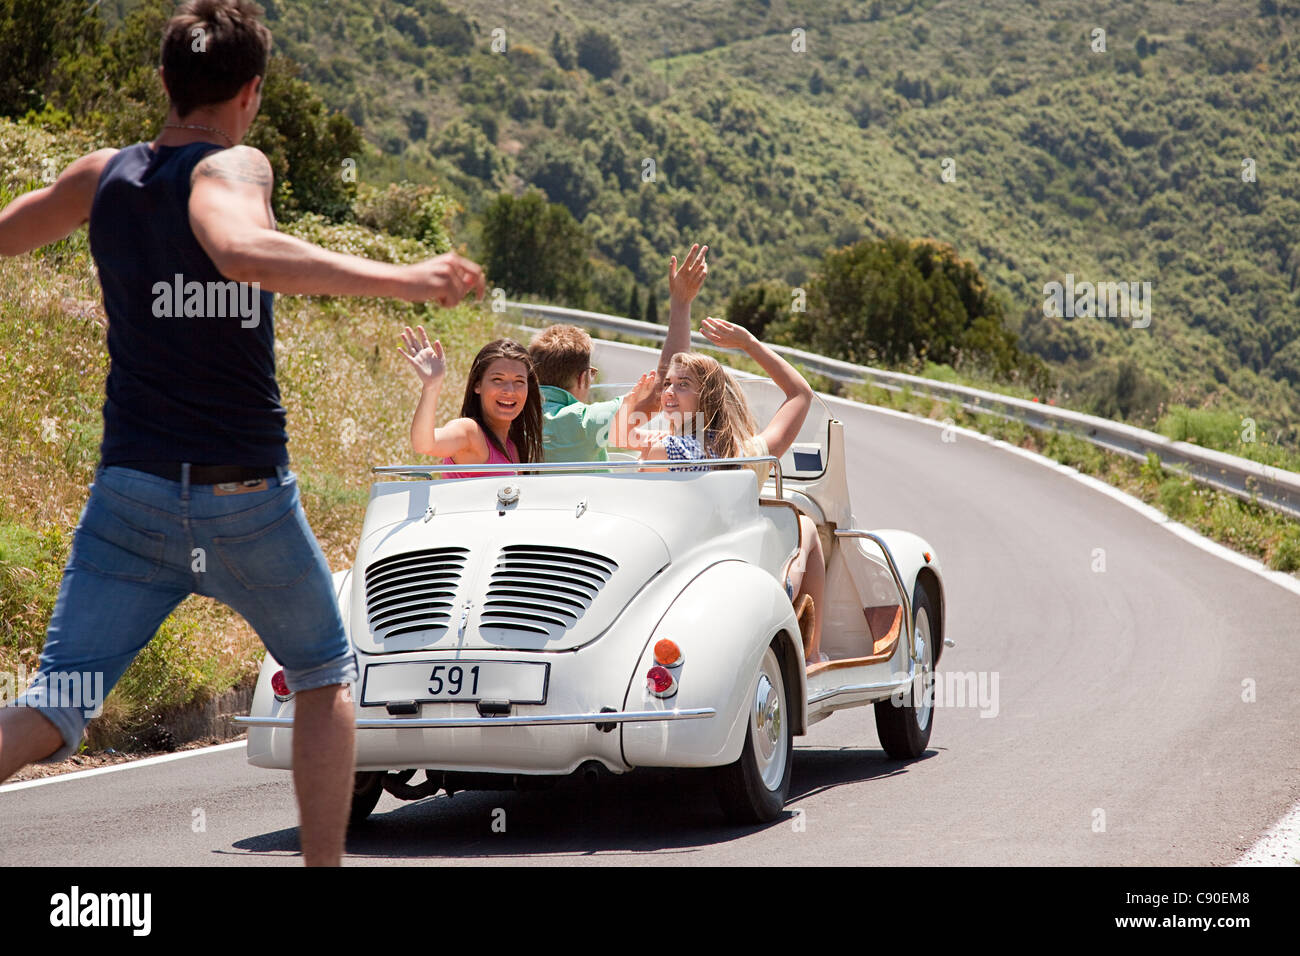 Convertible car guida passato hitchhiker Immagini Stock